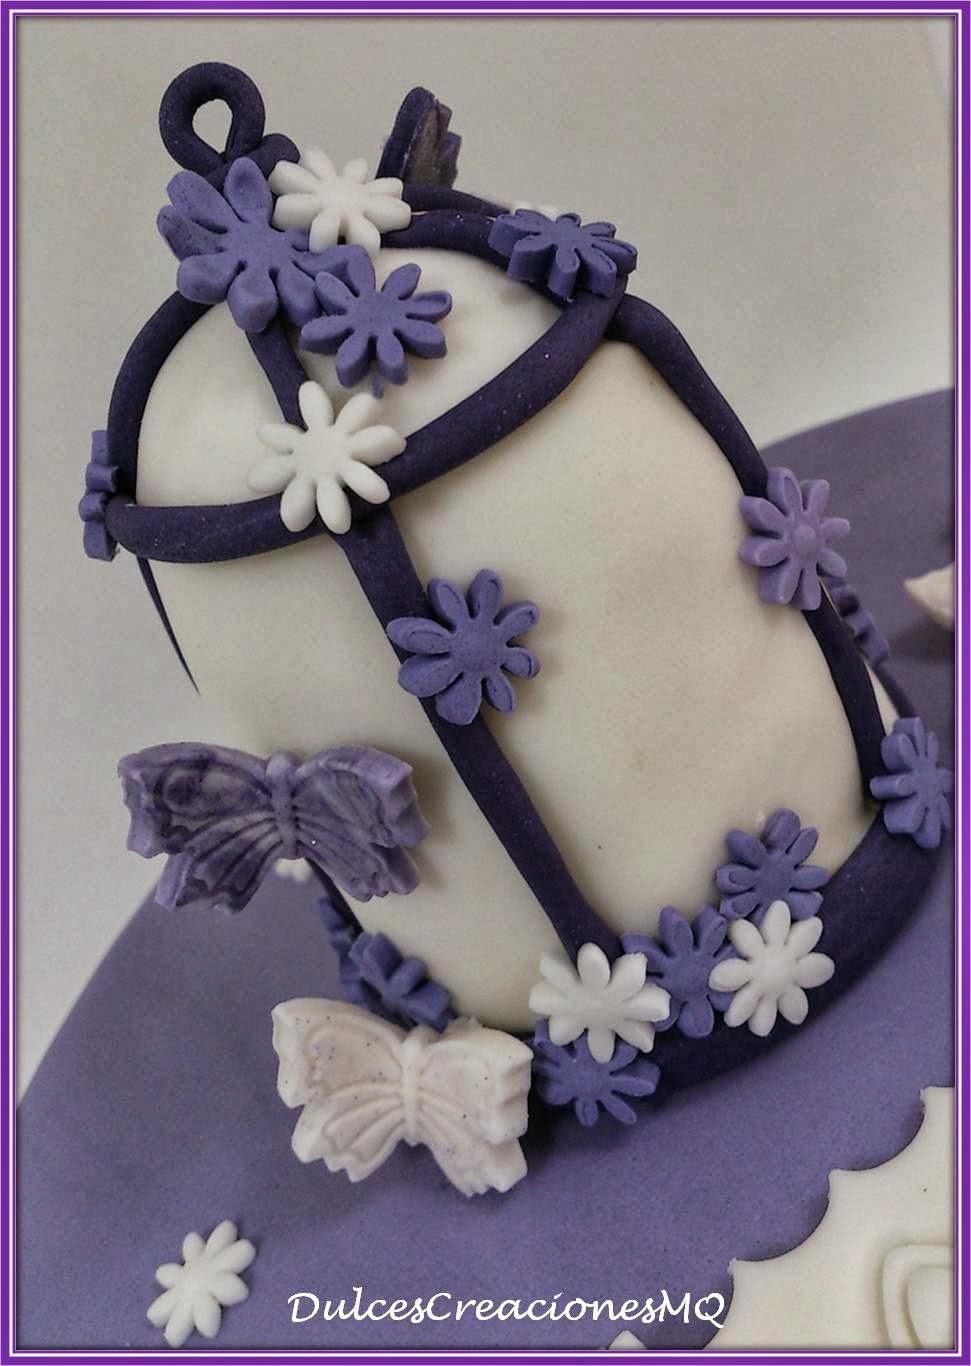 Tarta Jaula Primavera Pastel Torta Cumpleaños Flores Mariposas Lila Violeta Aniversario Mujer Niña Bizcocho Chocolate Esponjoso Buttercream Vainilla Crema Fondant